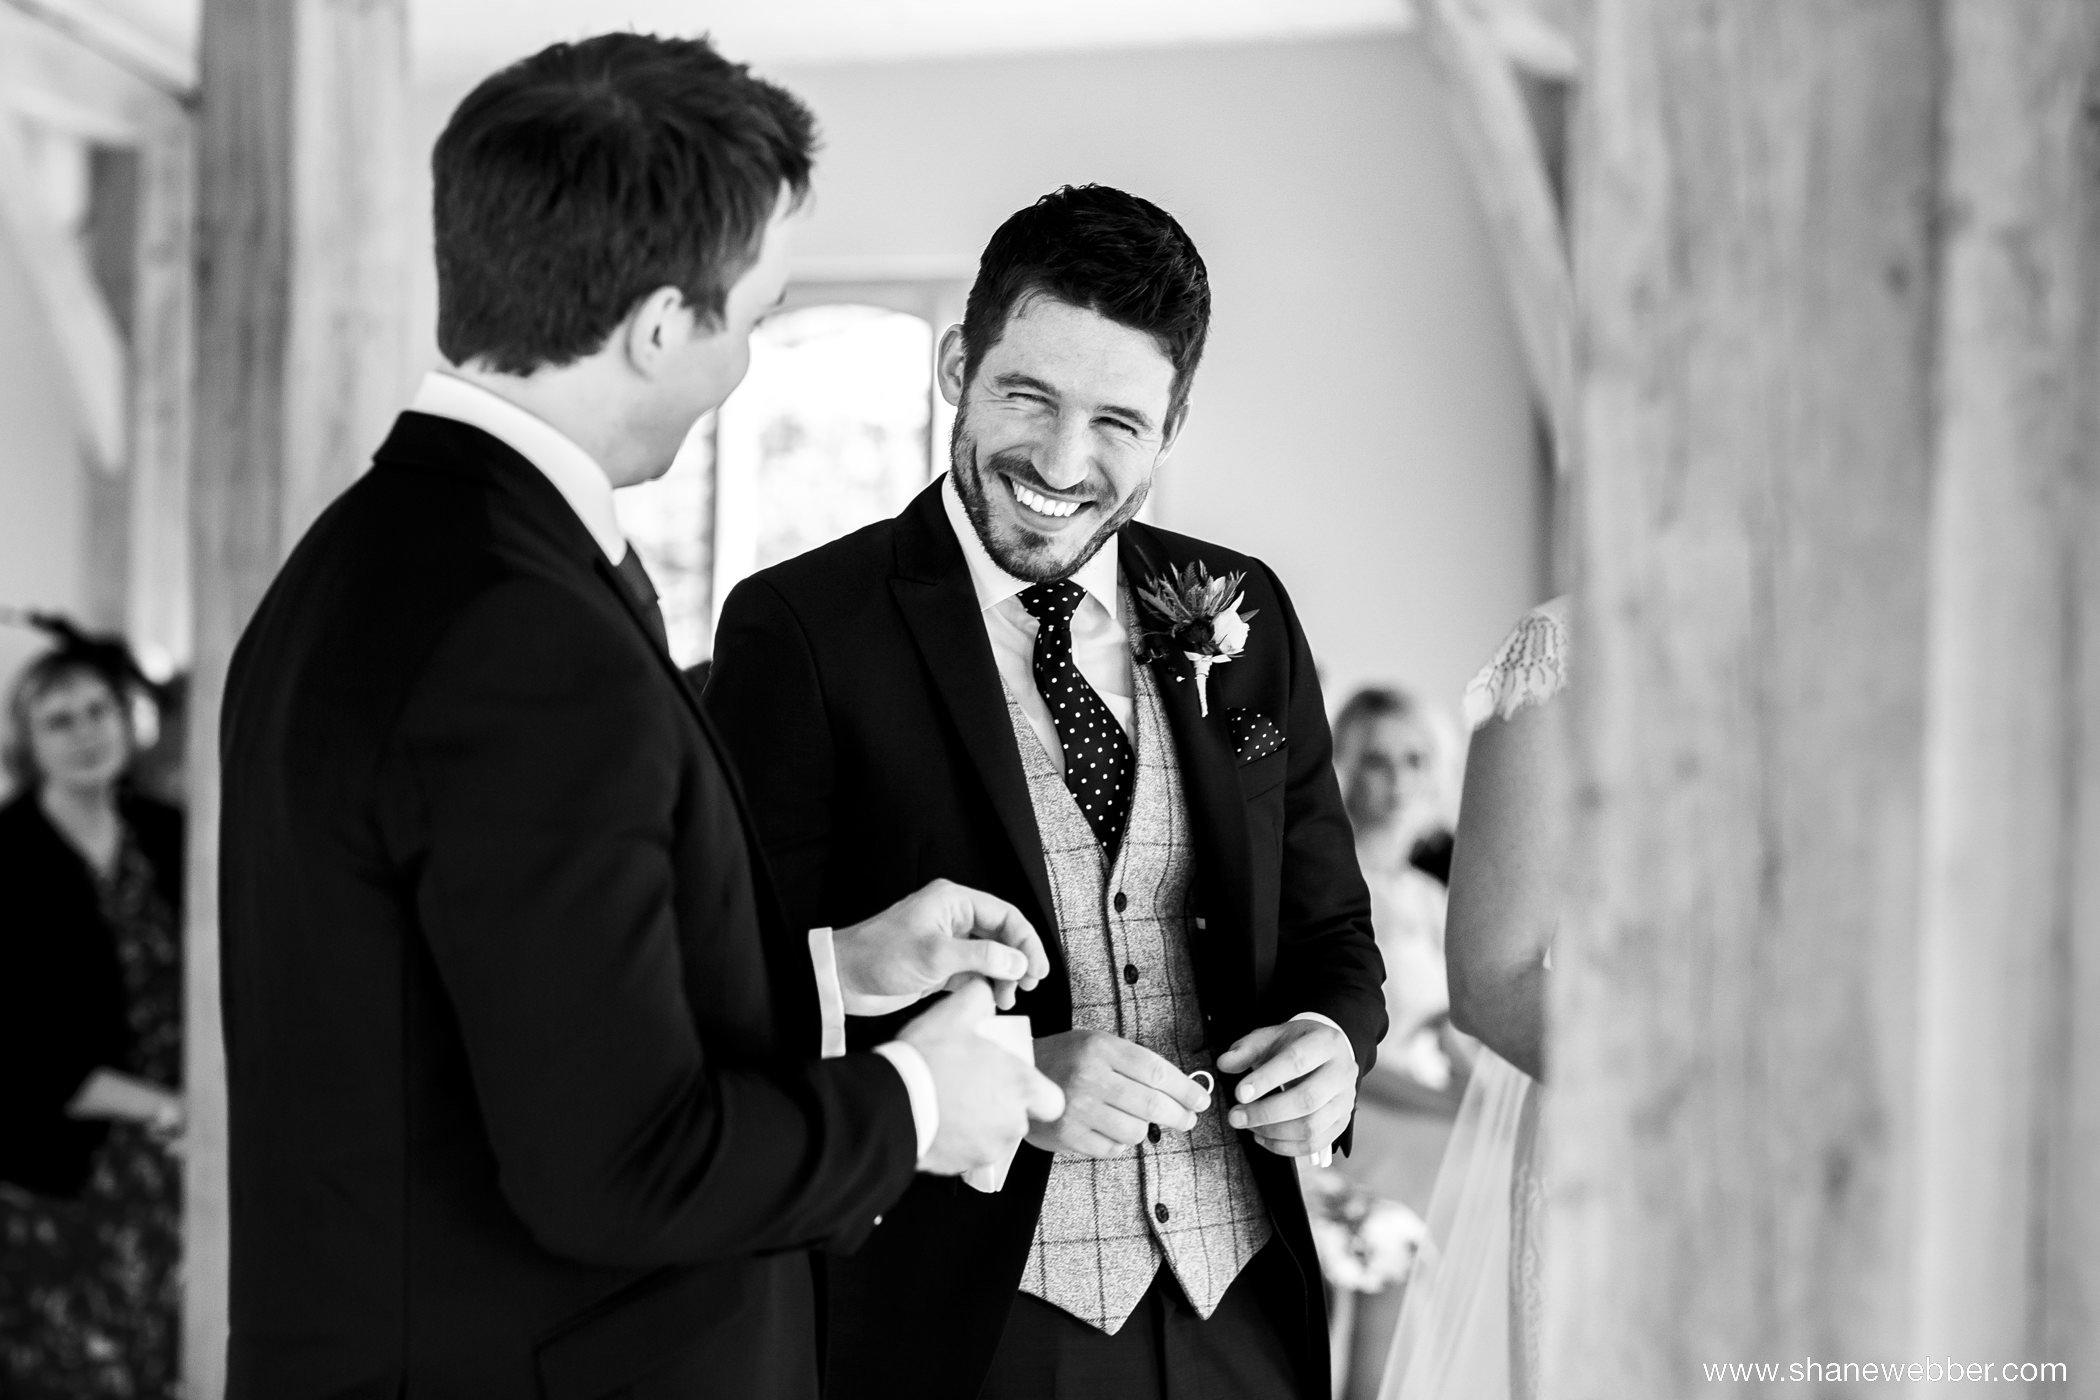 wedding ceremony black and white photo